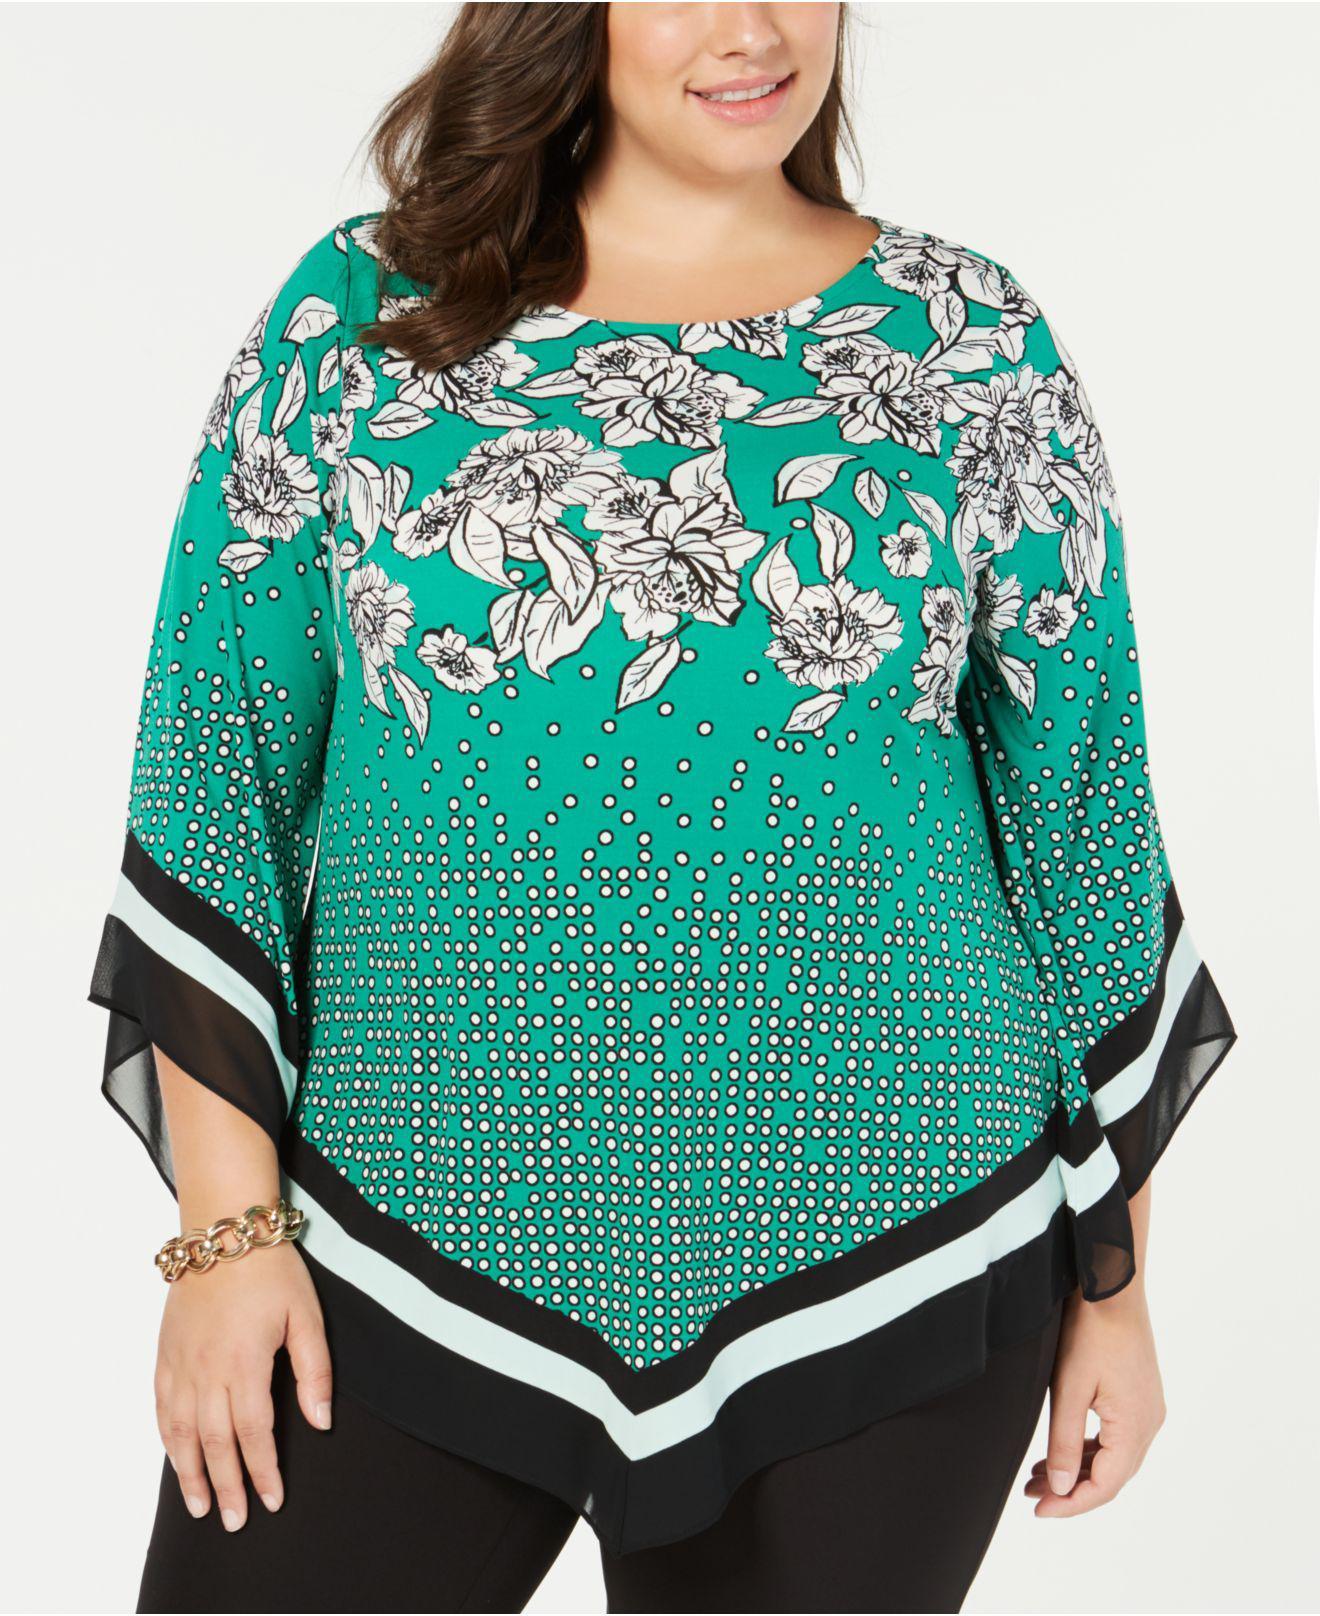 66c3152520d Alfani. Women s Green Plus Size Printed Pointed-hem Top ...